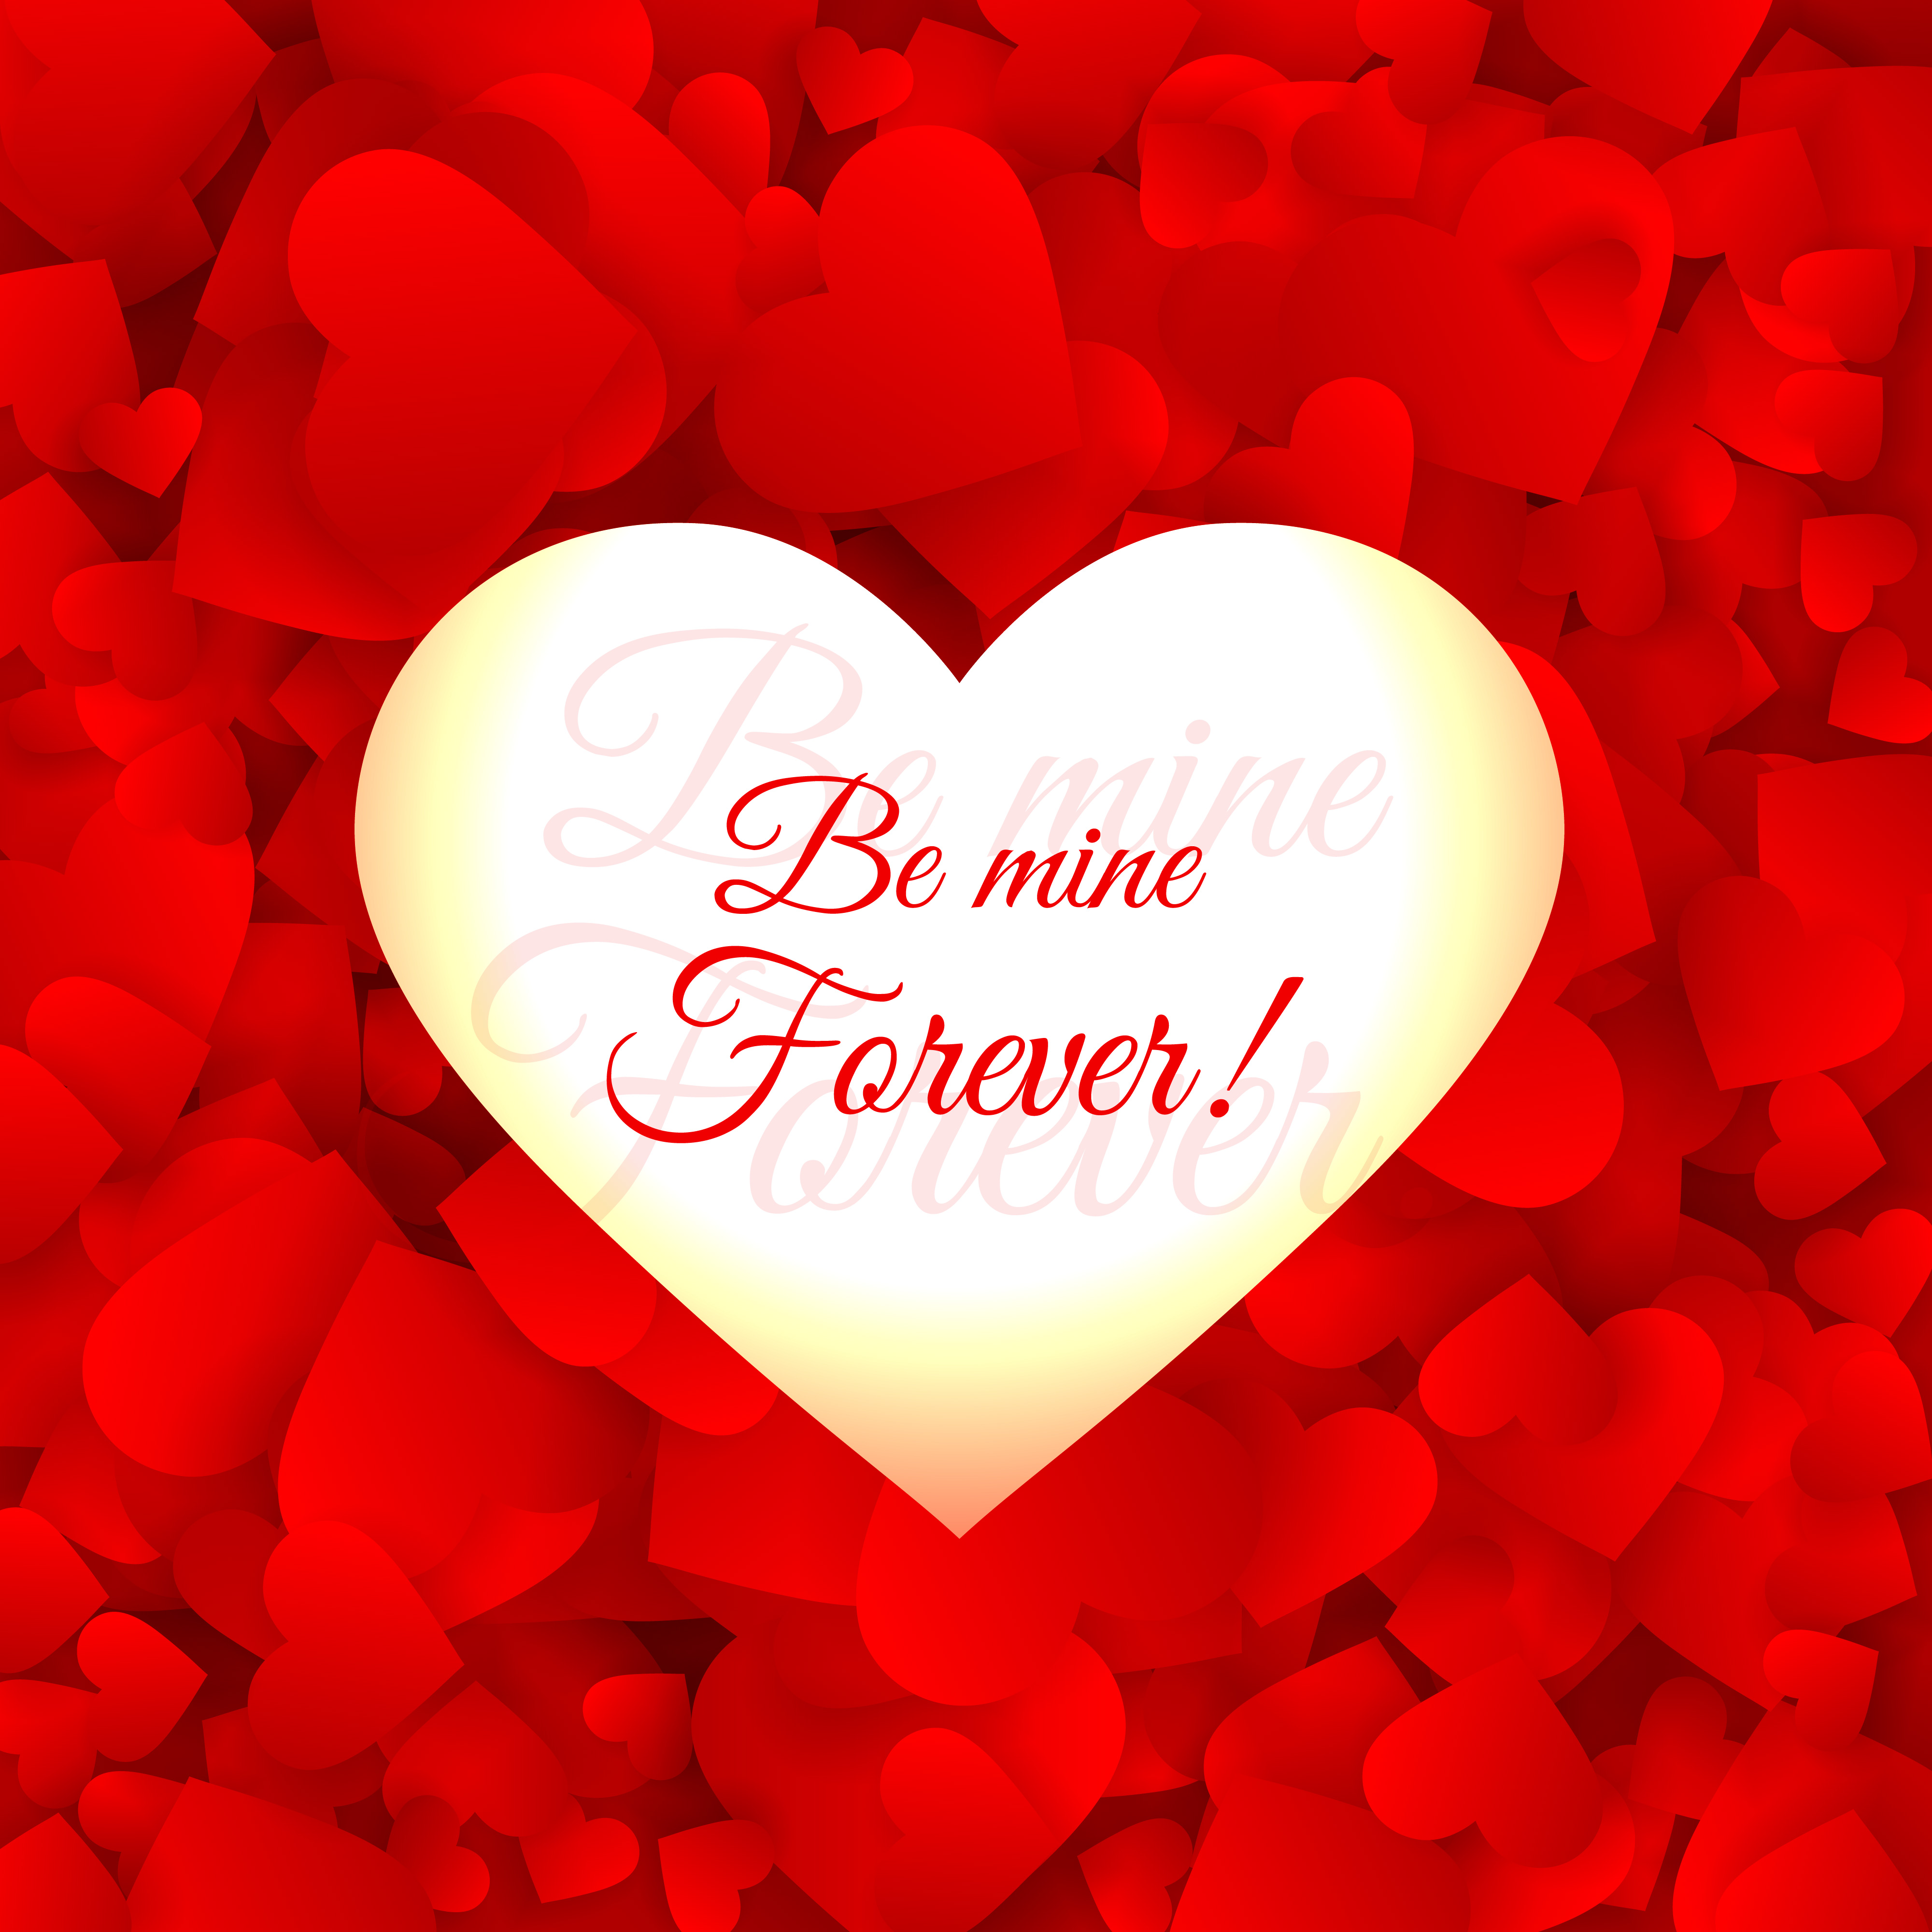 love hearts red background vector design illustration - download